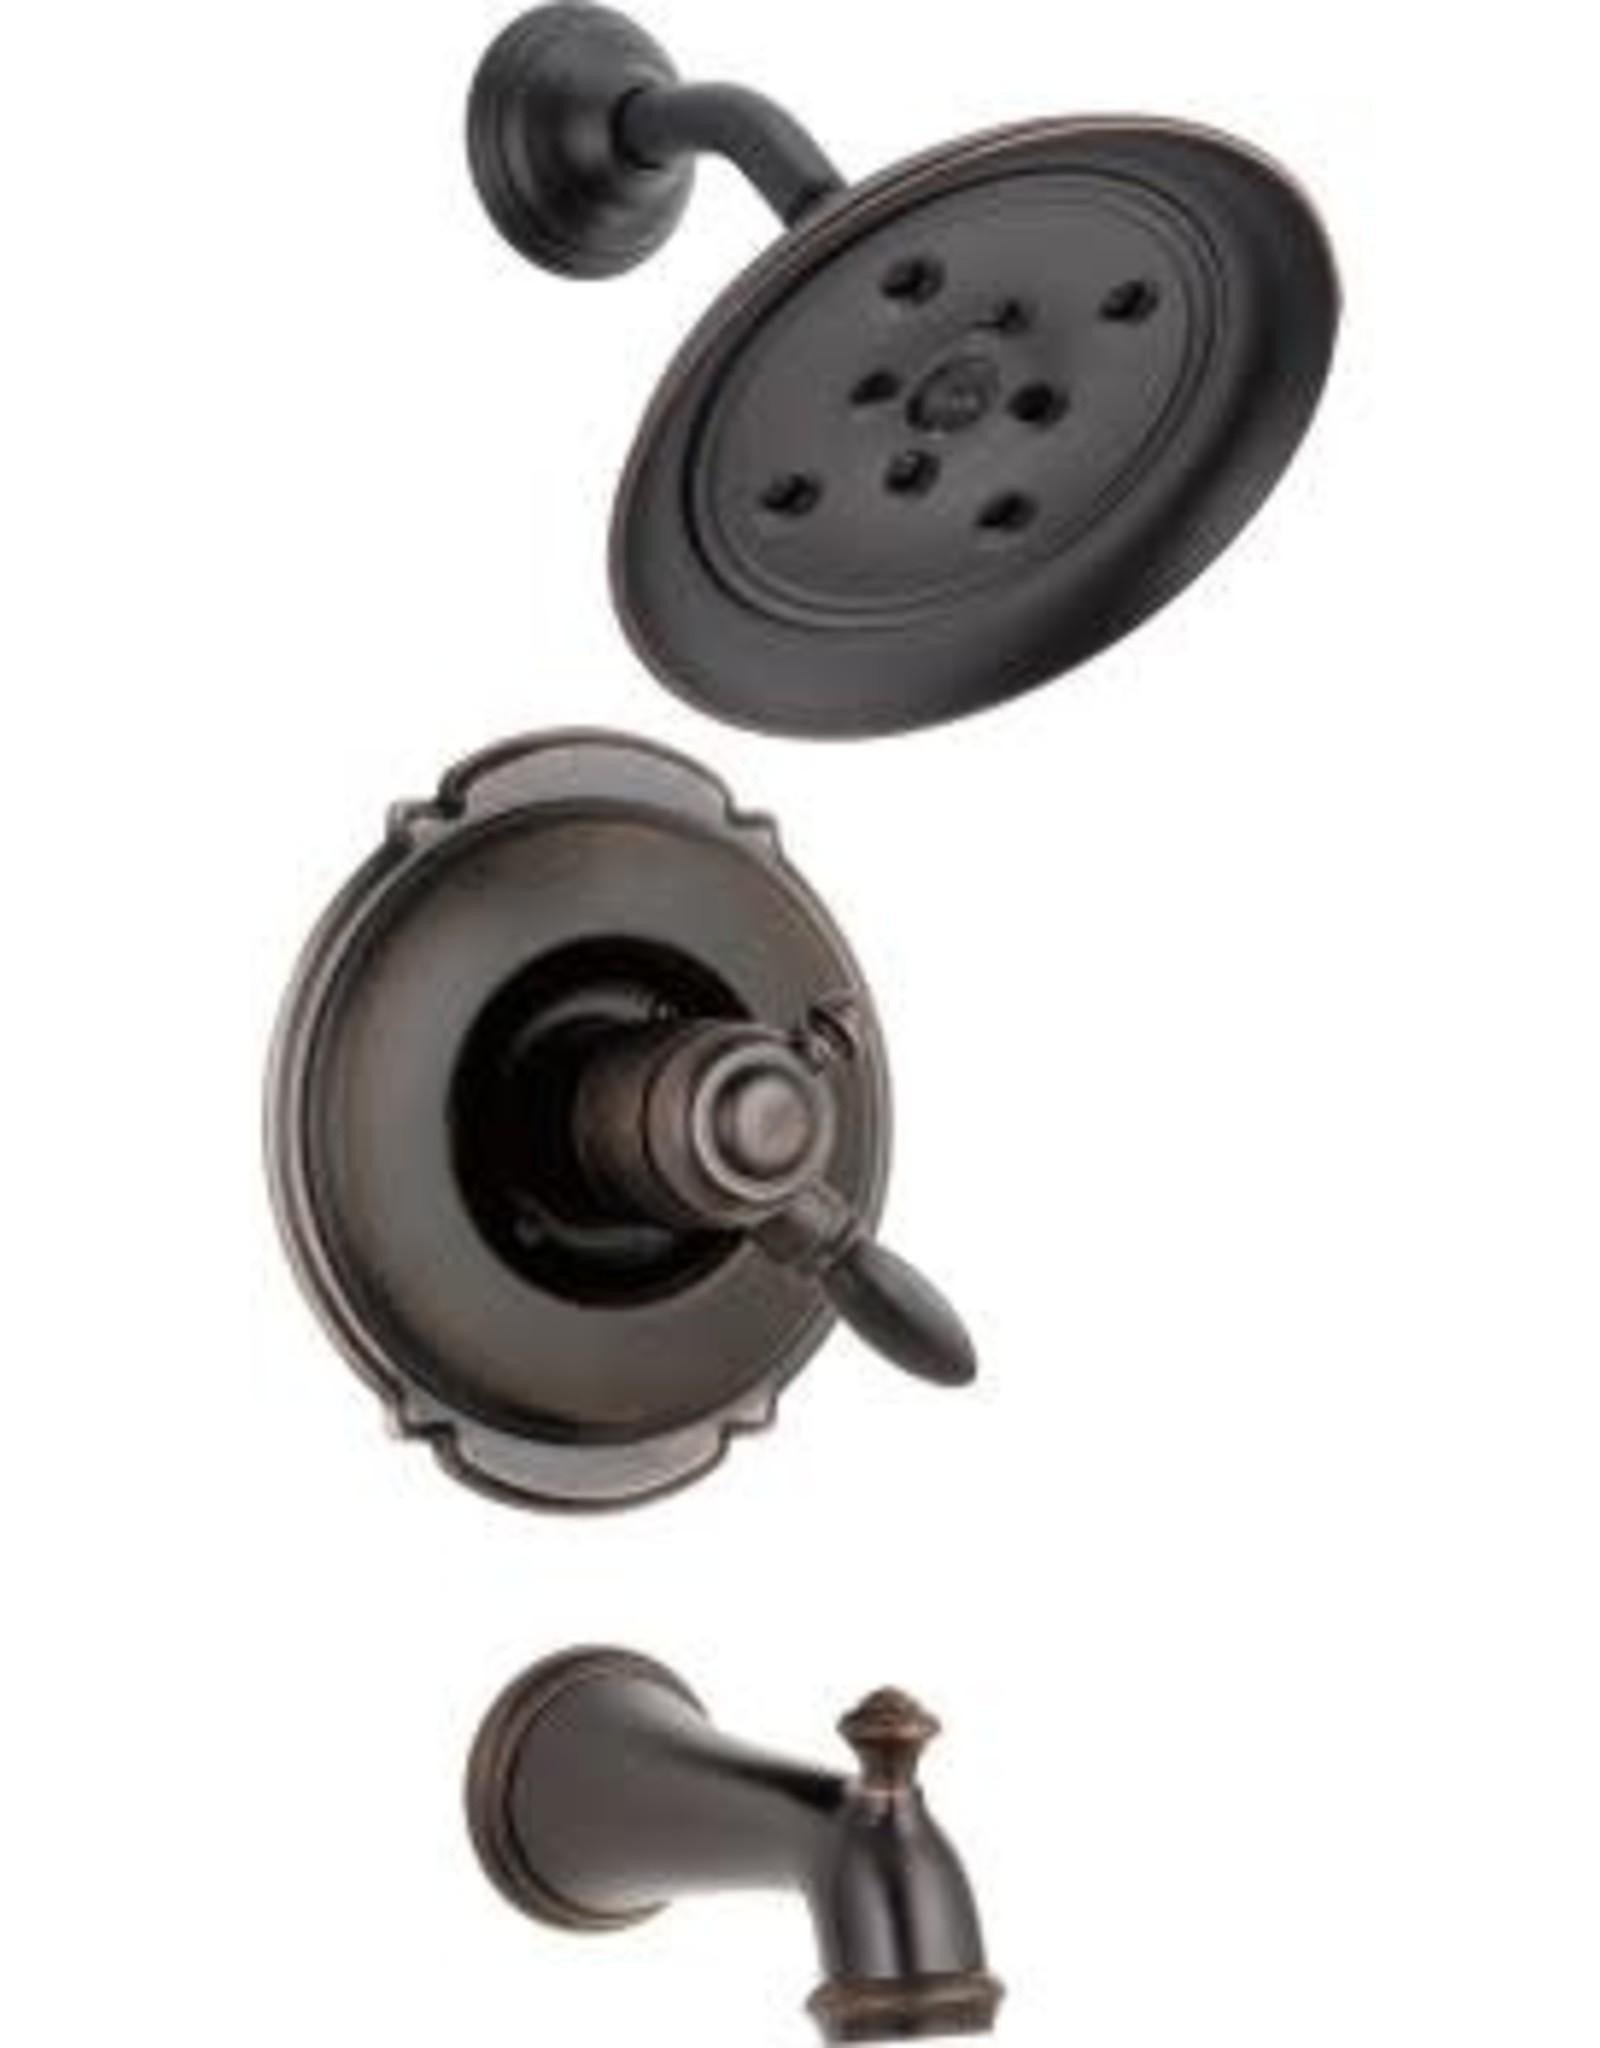 Delta DELTA VICTORIAN - VENETIAN BRONZE MONITOR 17 SERIES TUB & SHOWER TRIM